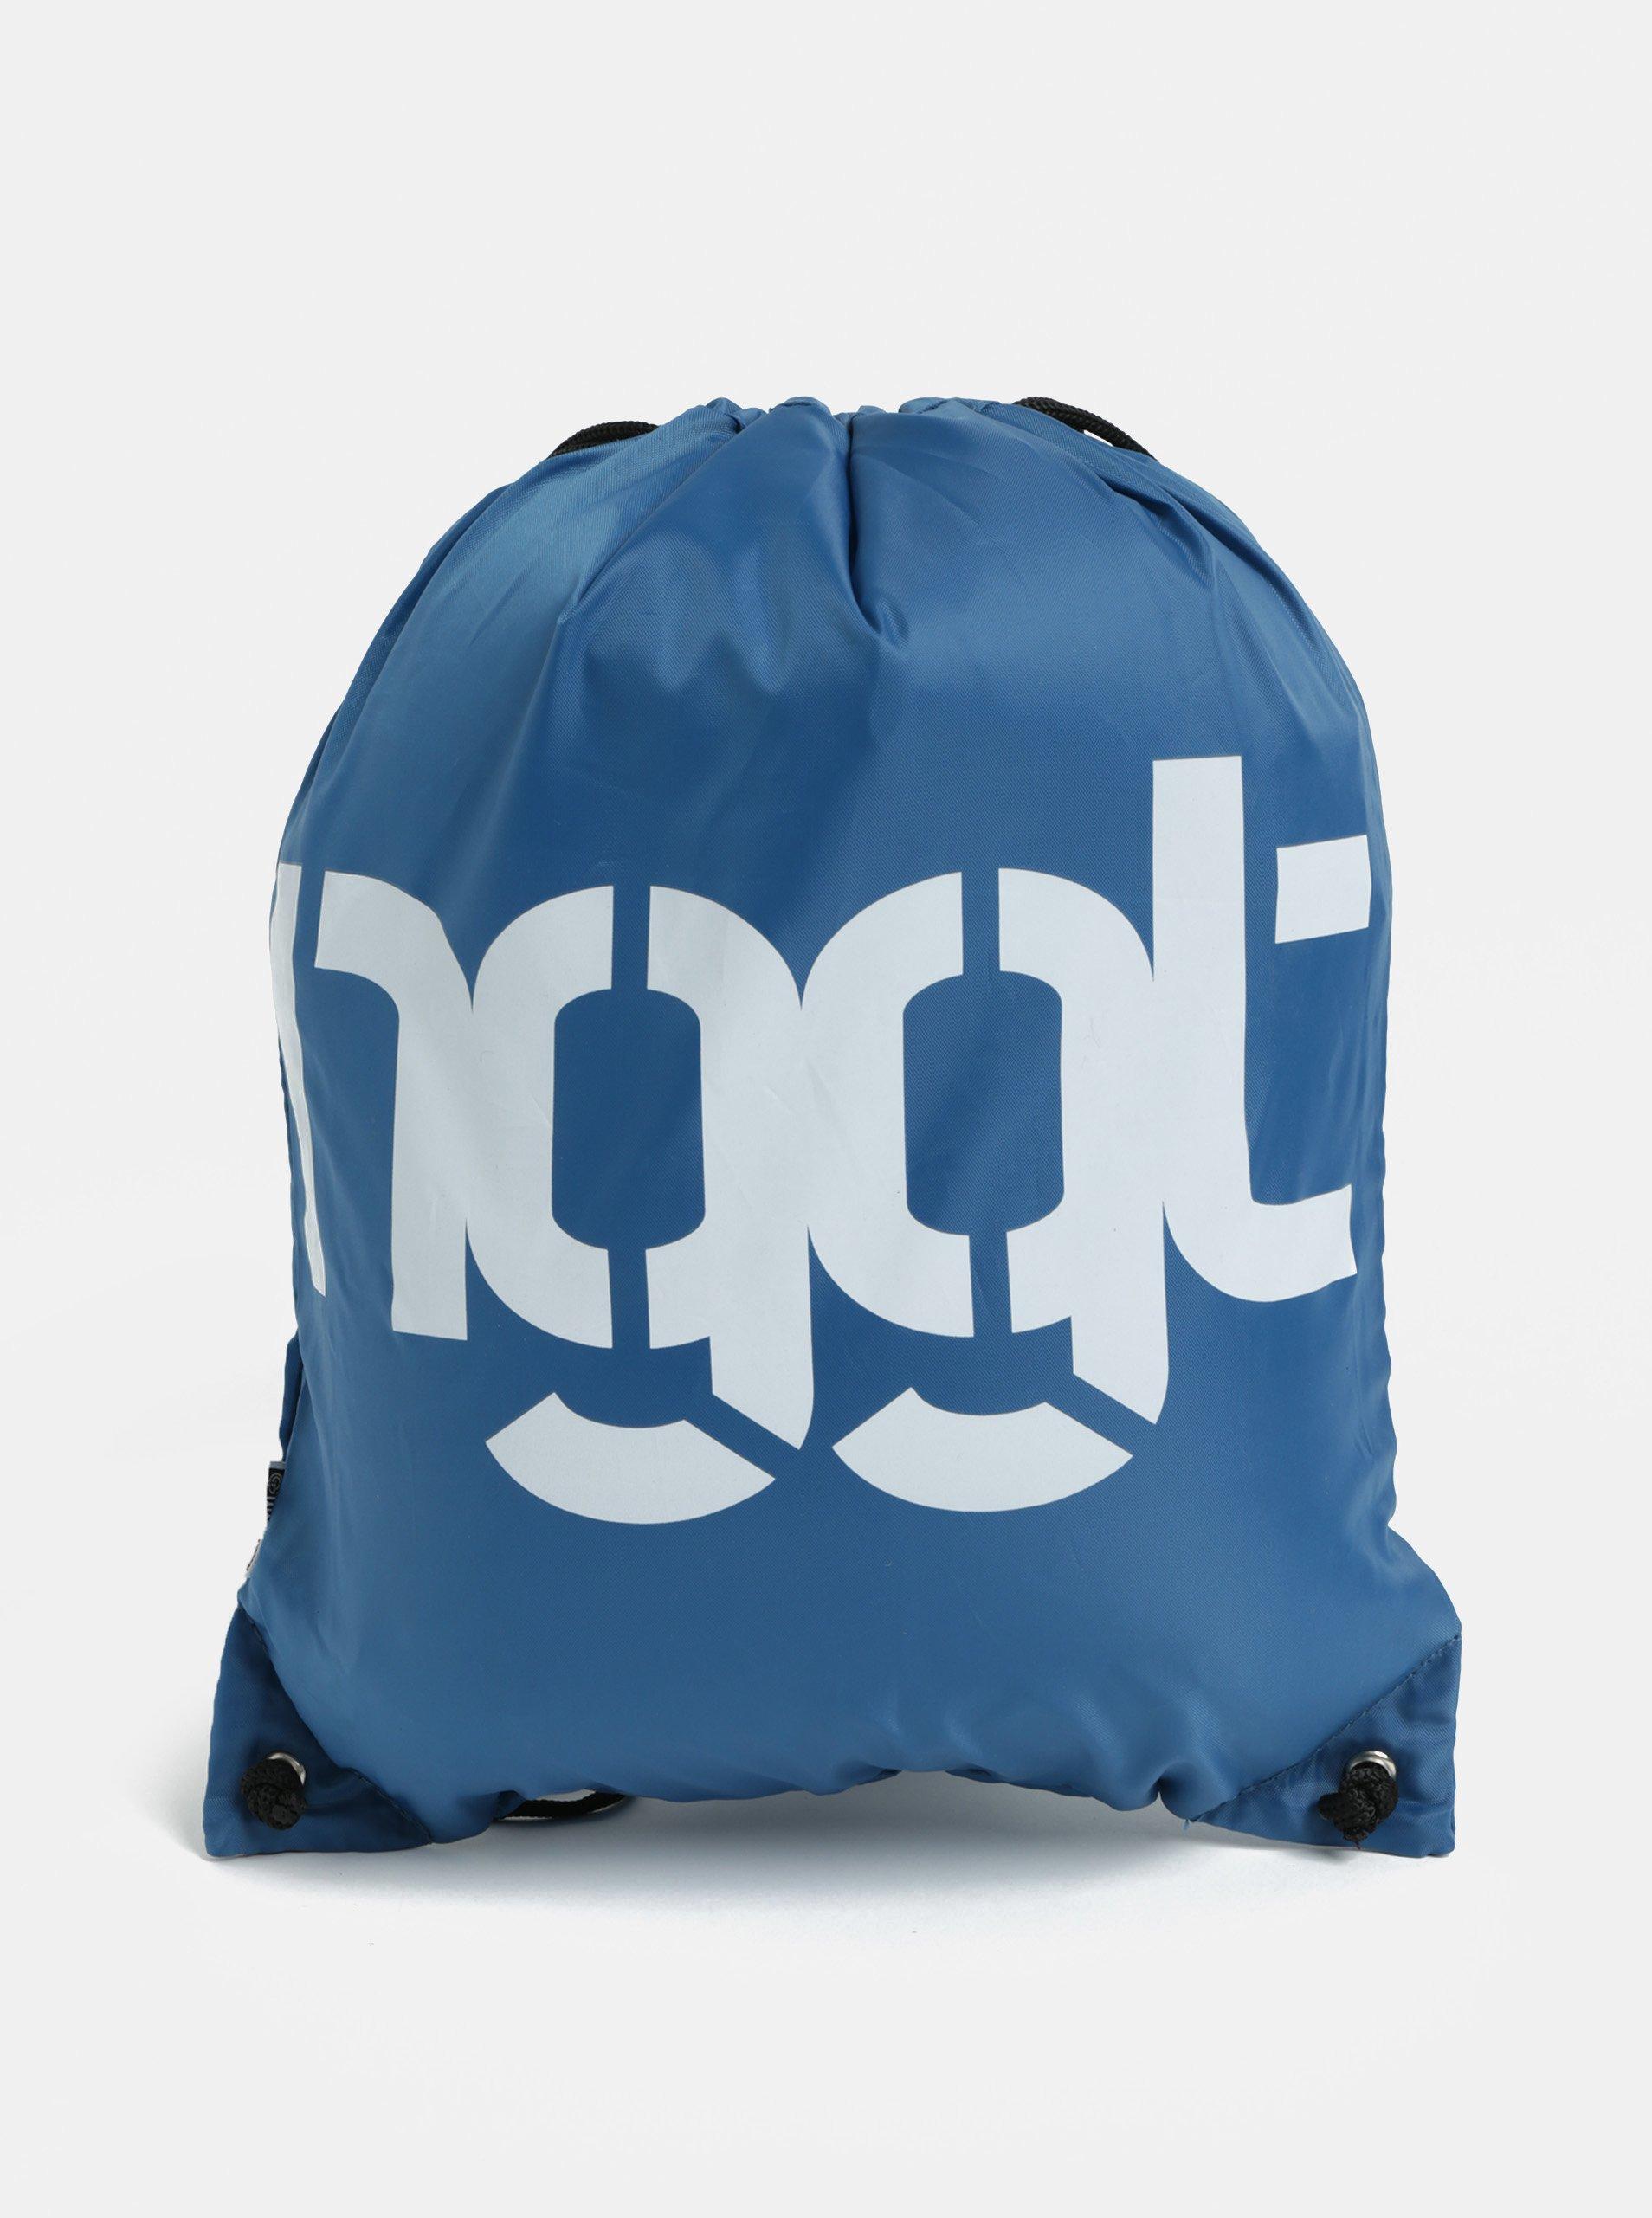 fb5ccf7171 Modrý vak s potlačou Nugget Benched